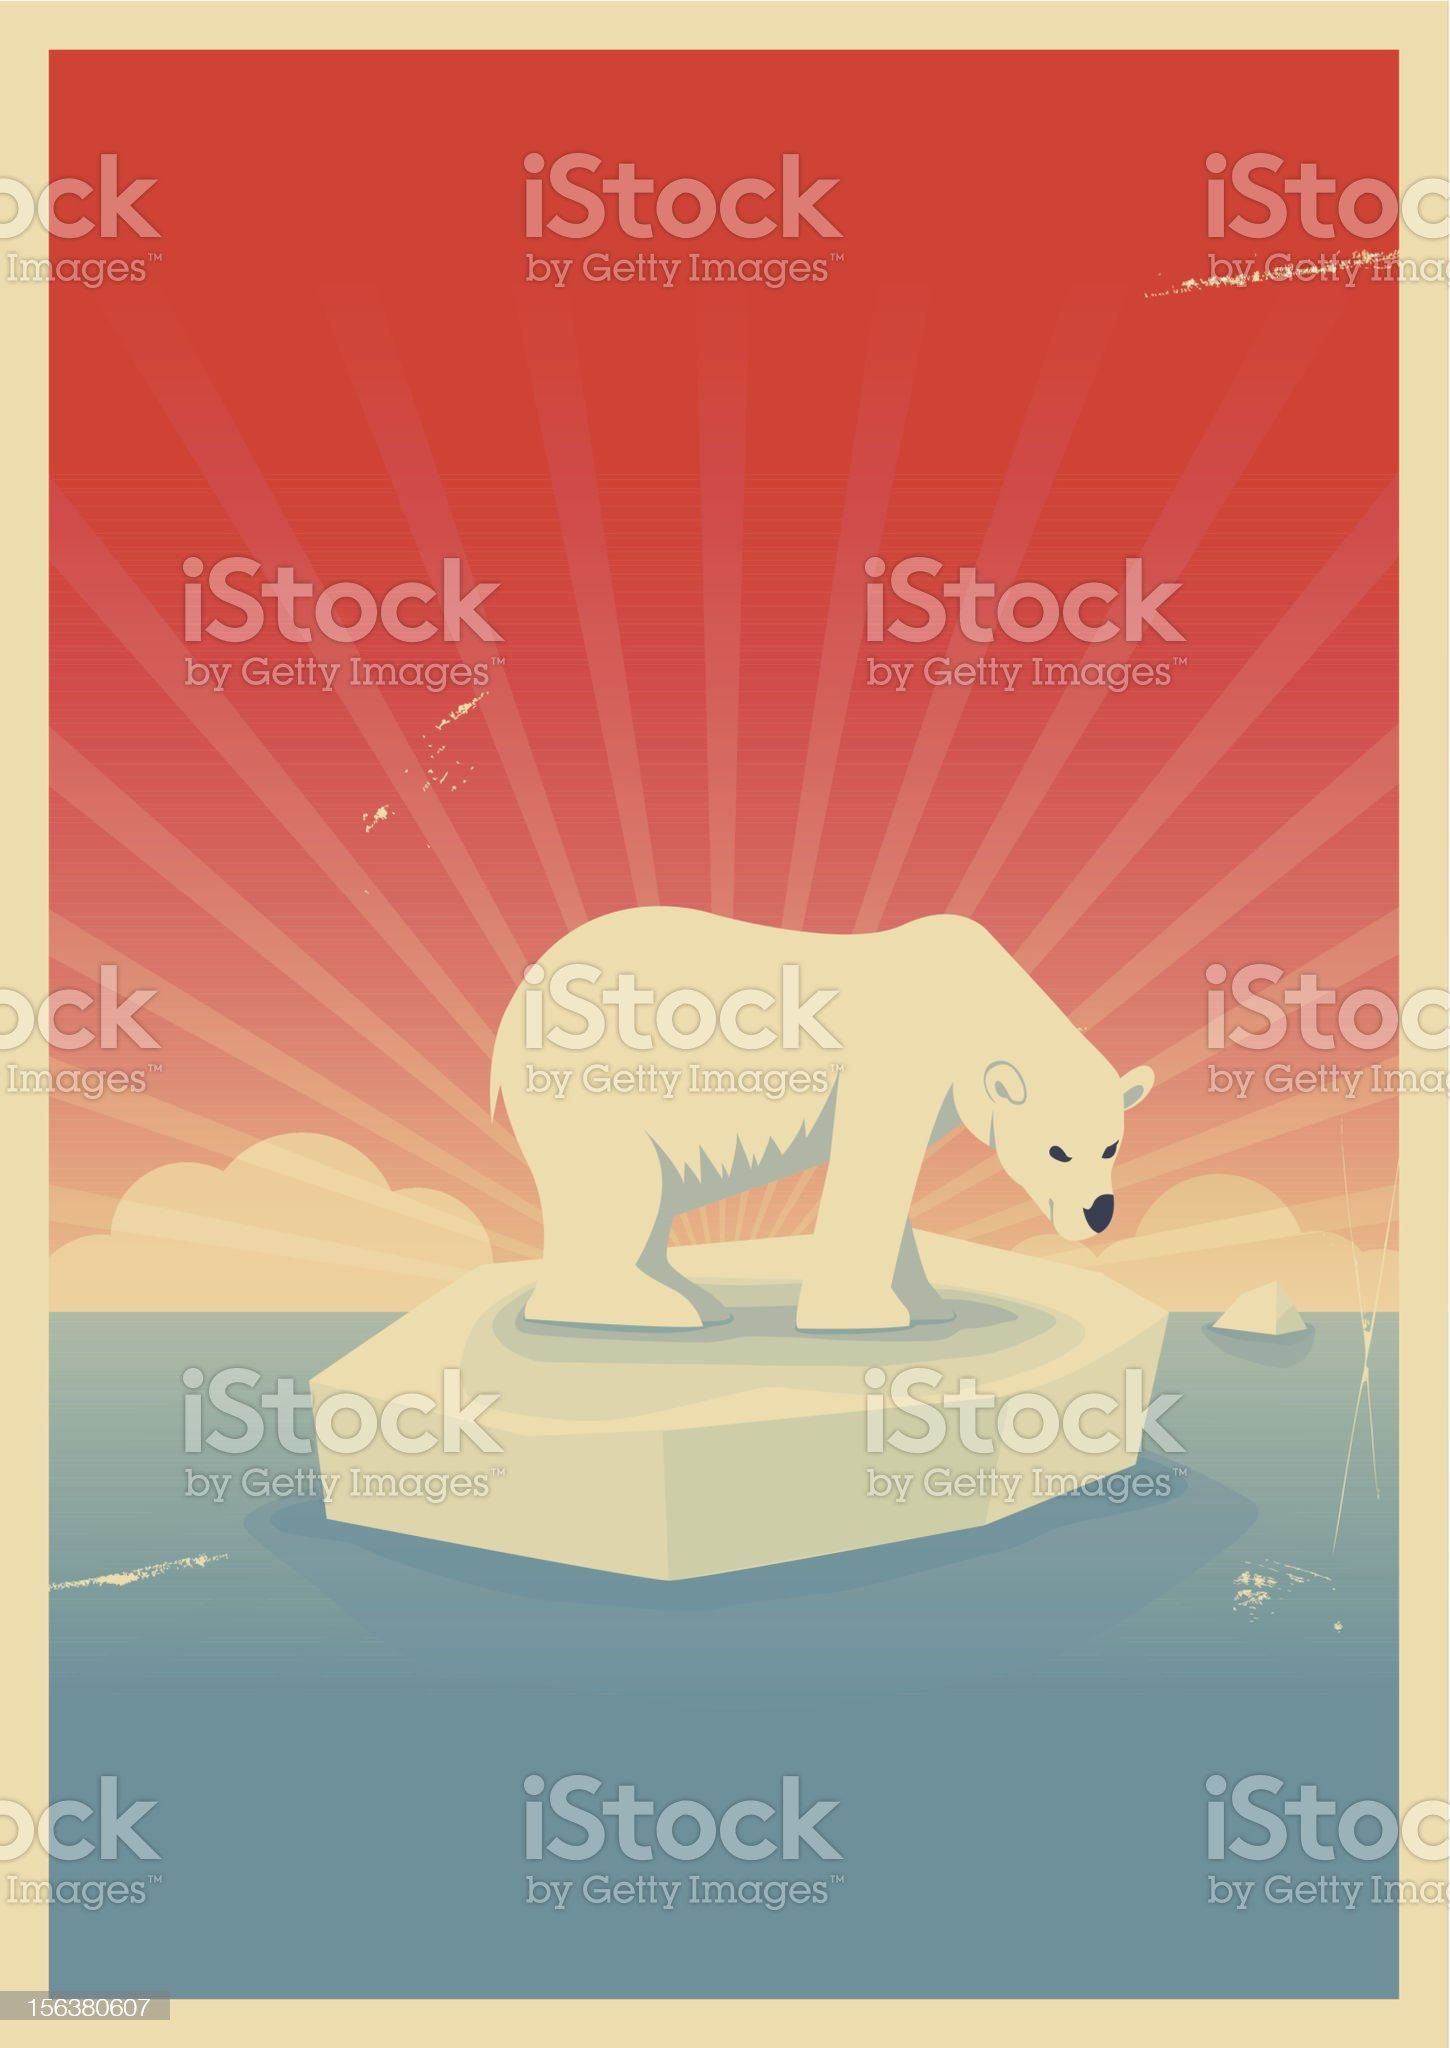 Save polar bear poster royalty-free stock vector art